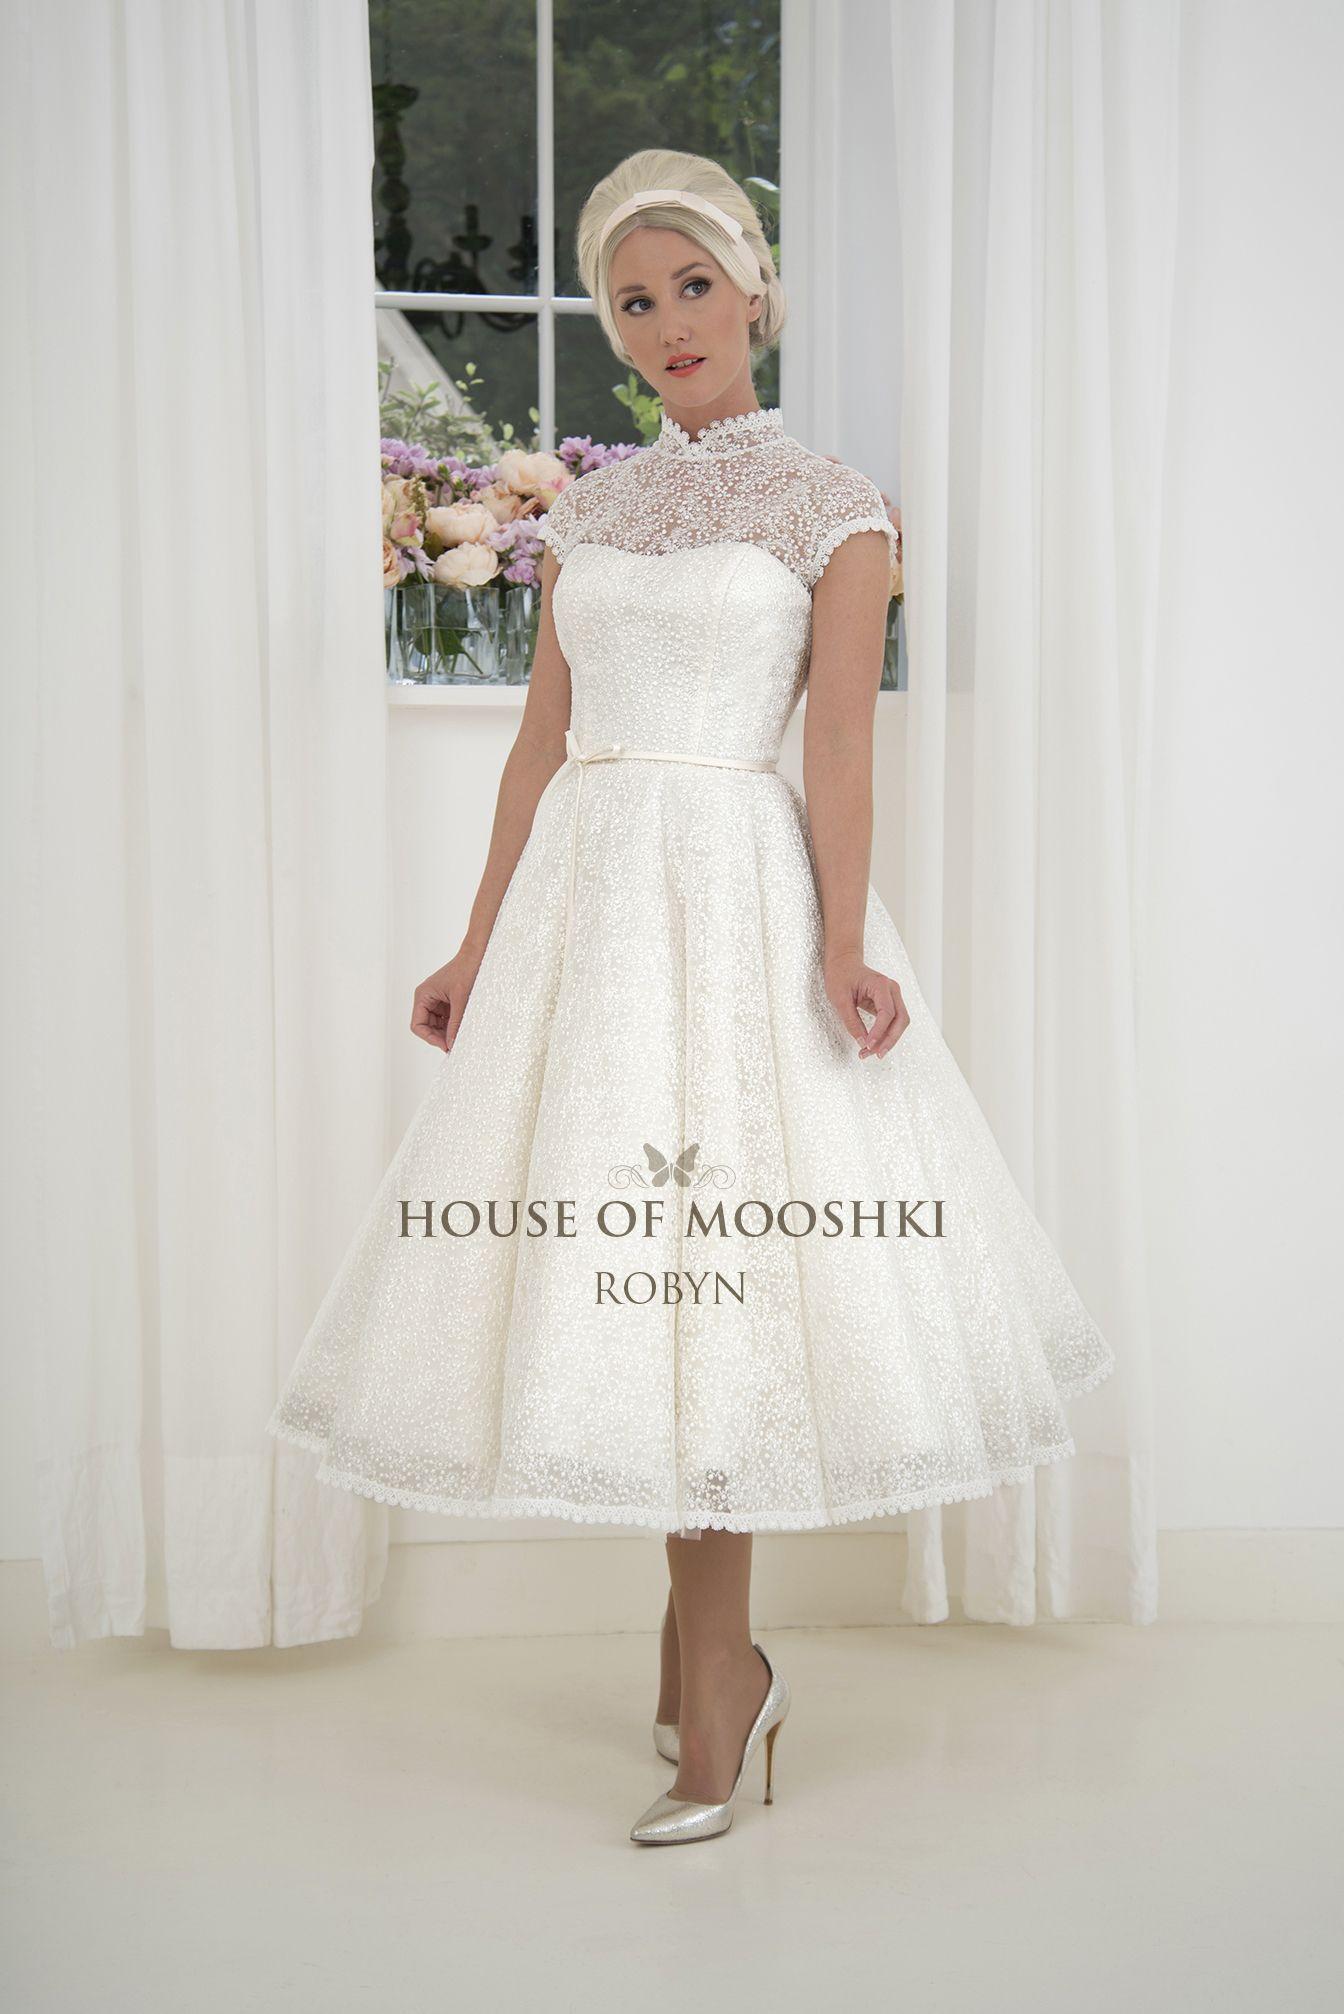 Robyn Adorable Short Calf Length Lace Wedding Dress With Dipped Bodice Mandarin Collar Short Wedding Dress Tea Length Wedding Dress Designer Wedding Dresses [ 2014 x 1344 Pixel ]